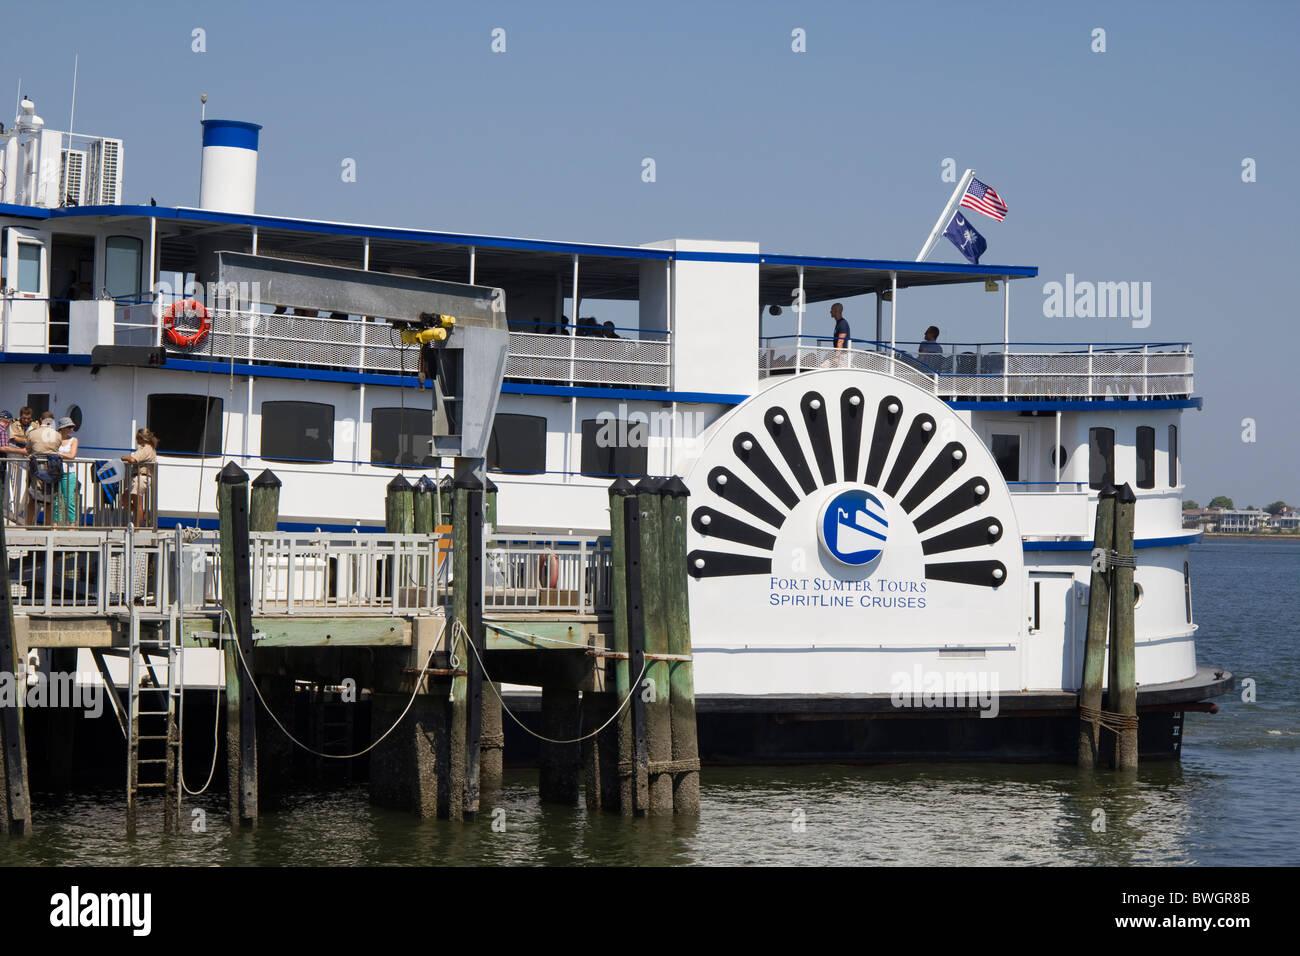 Boat Tours Charleston Sc Fort Sumter